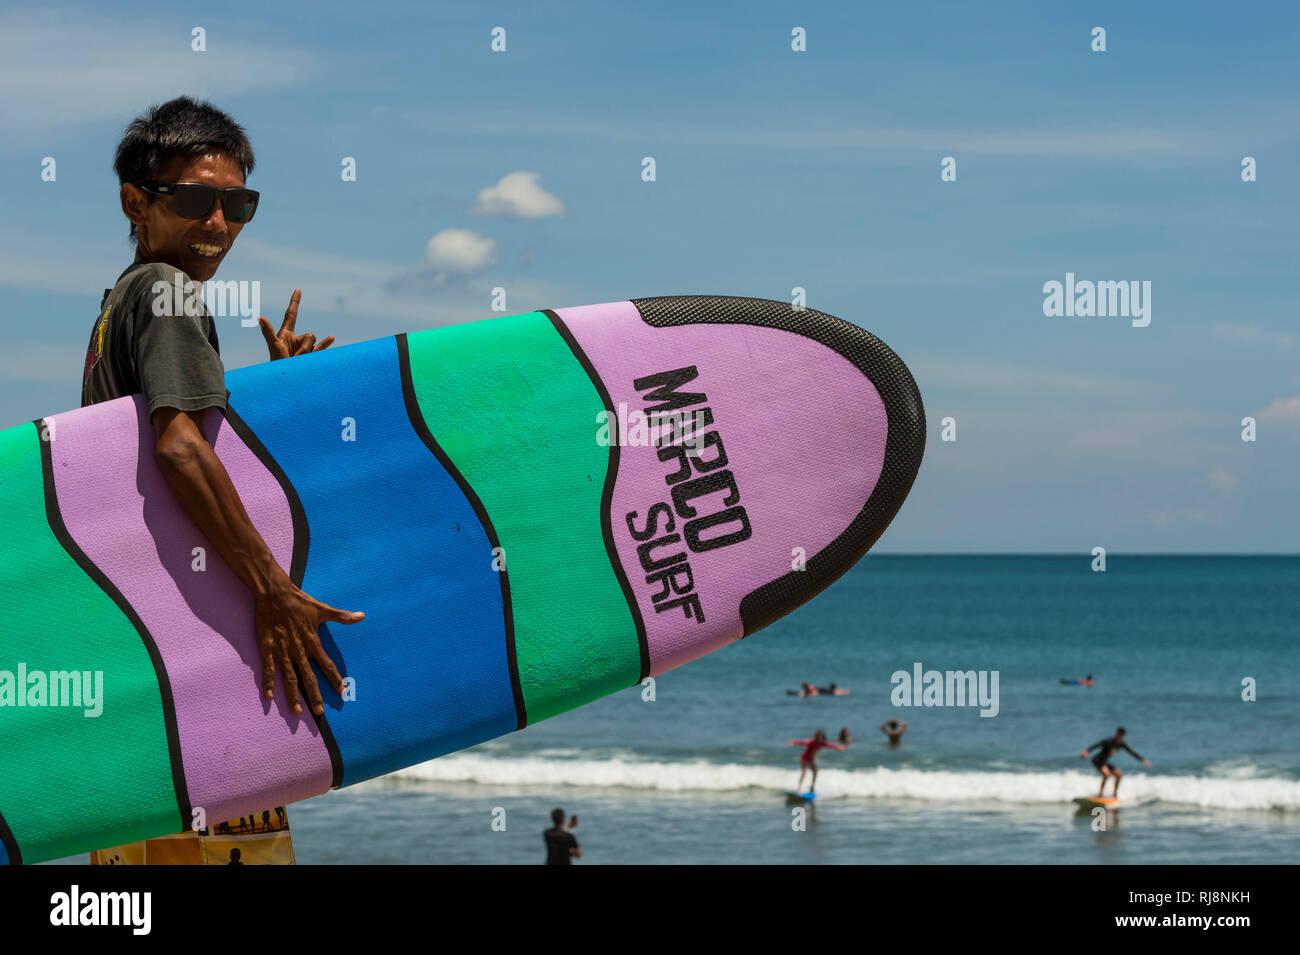 Surfer am Bining Beach - Stock Image